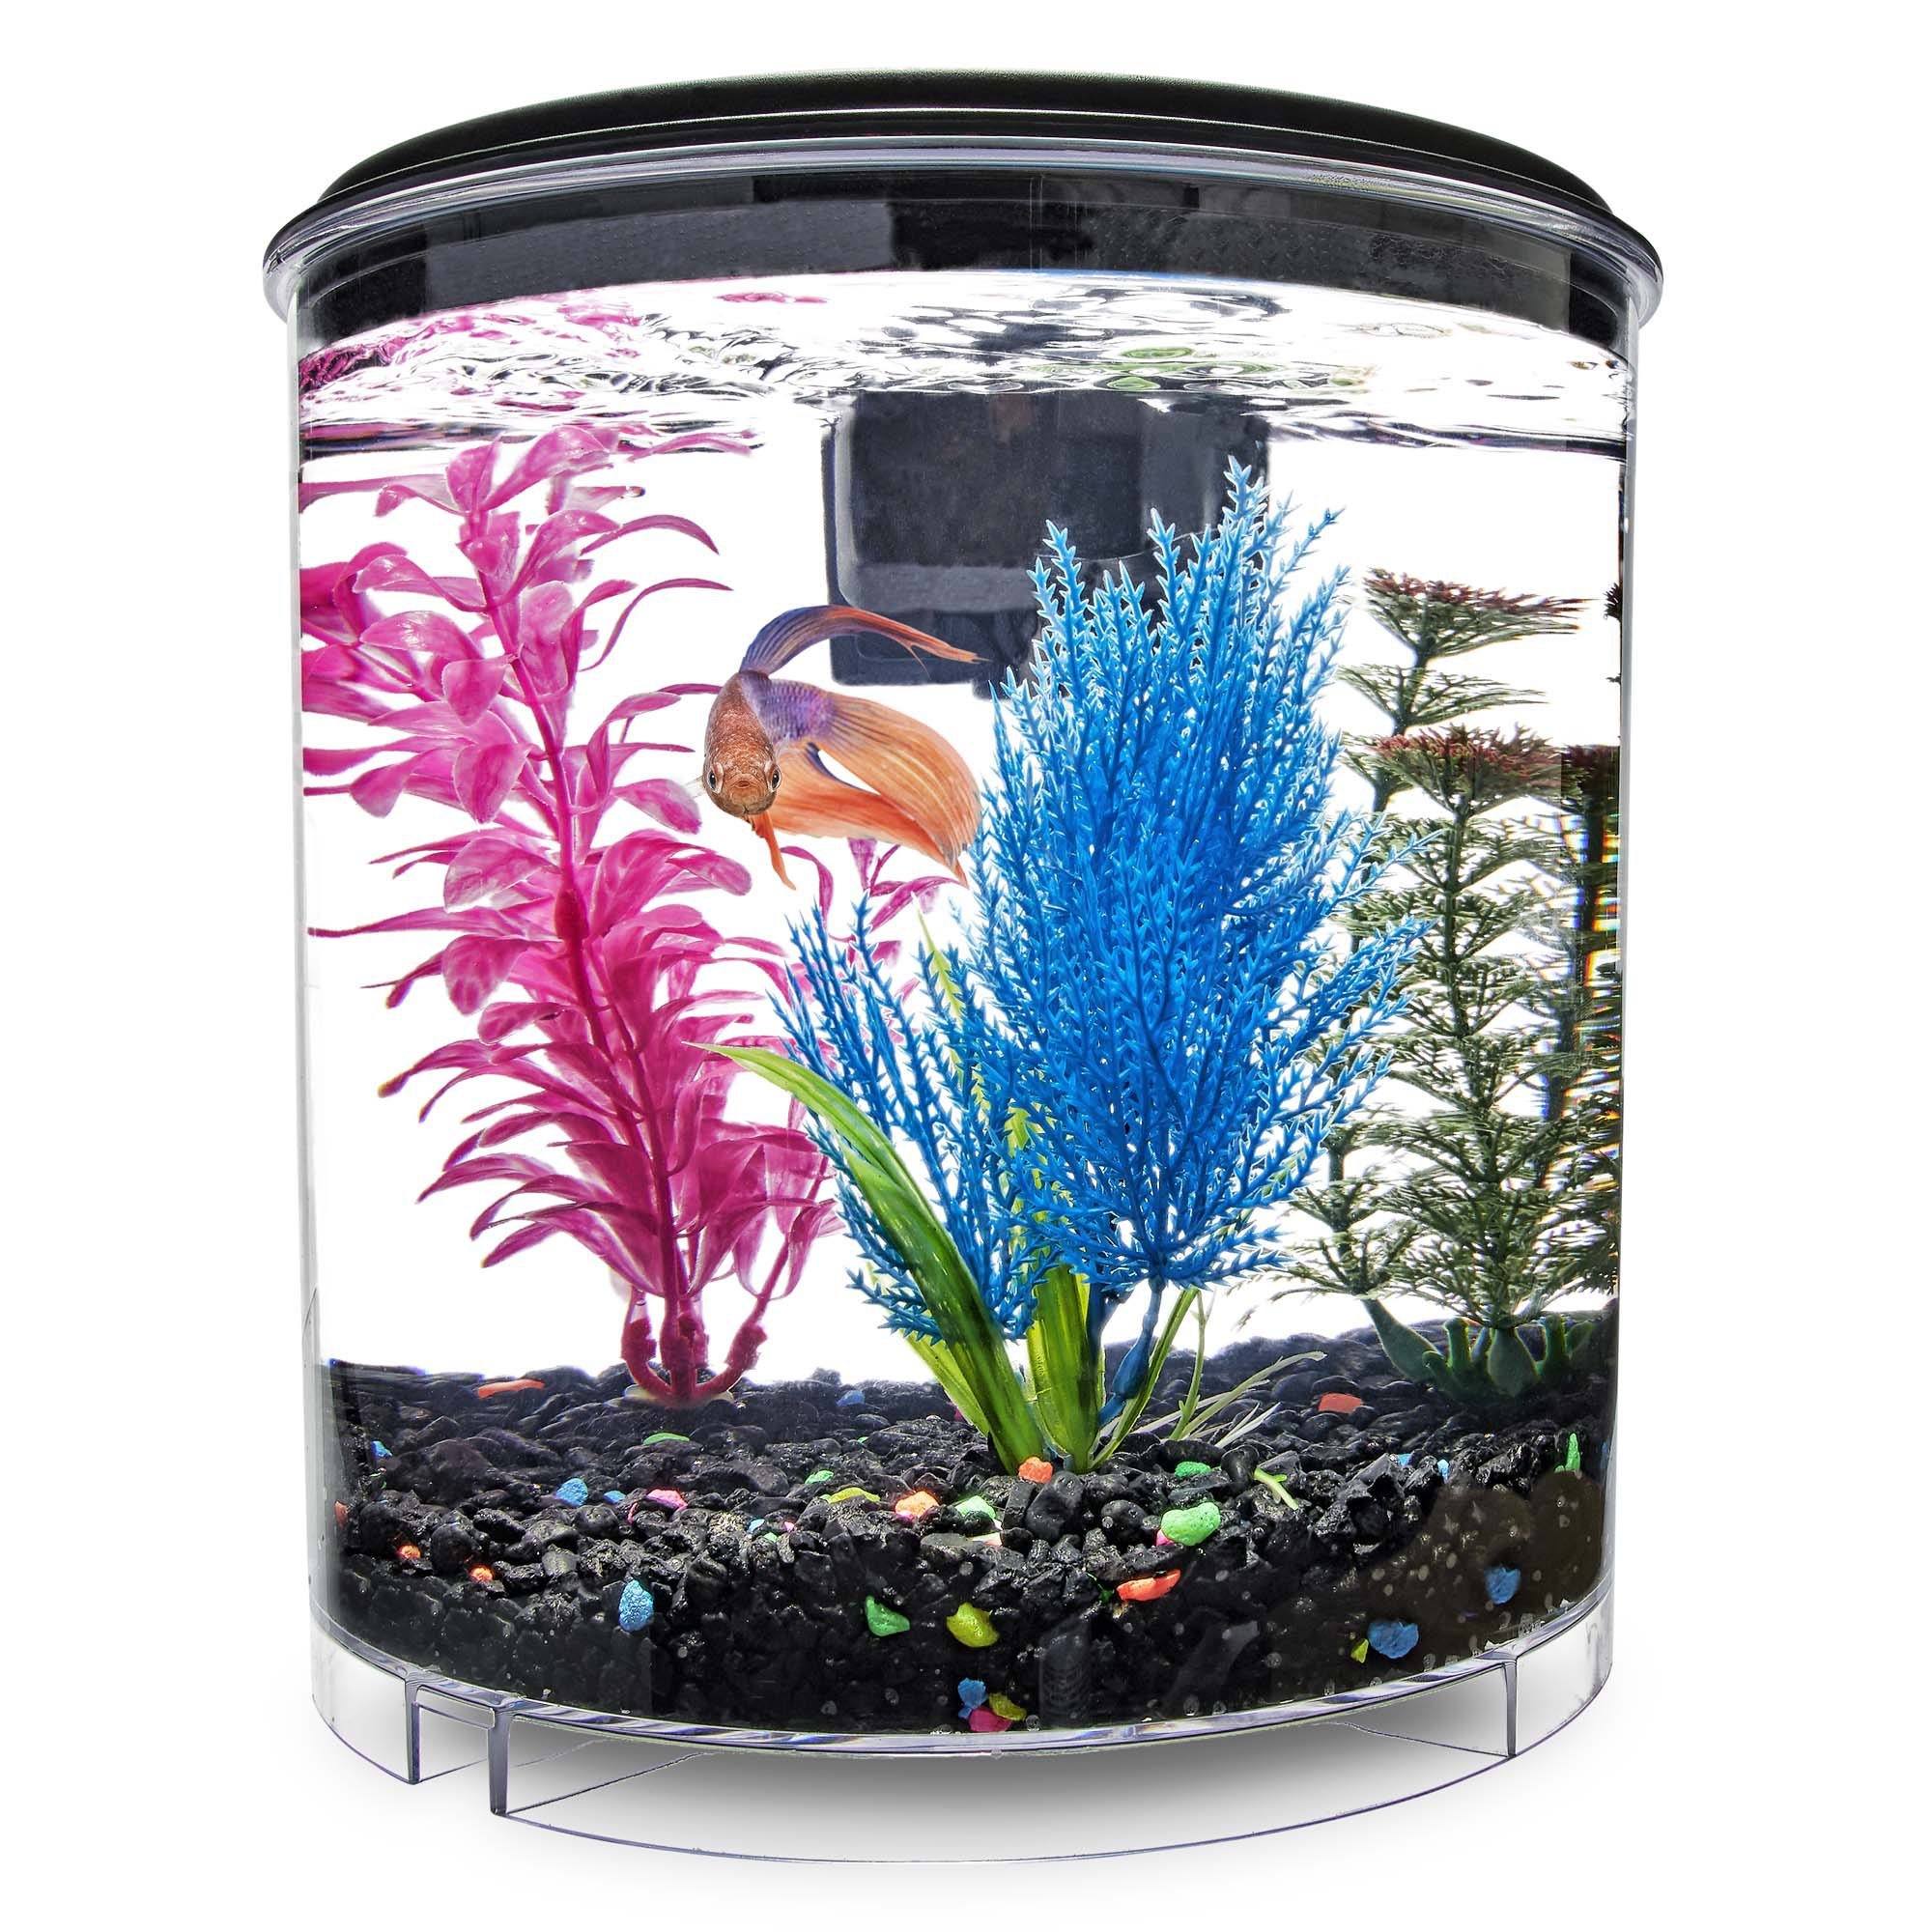 Imagitarium 2 Gallon Cumberland Tank Petco In 2020 Petco Fish Tank Gallon